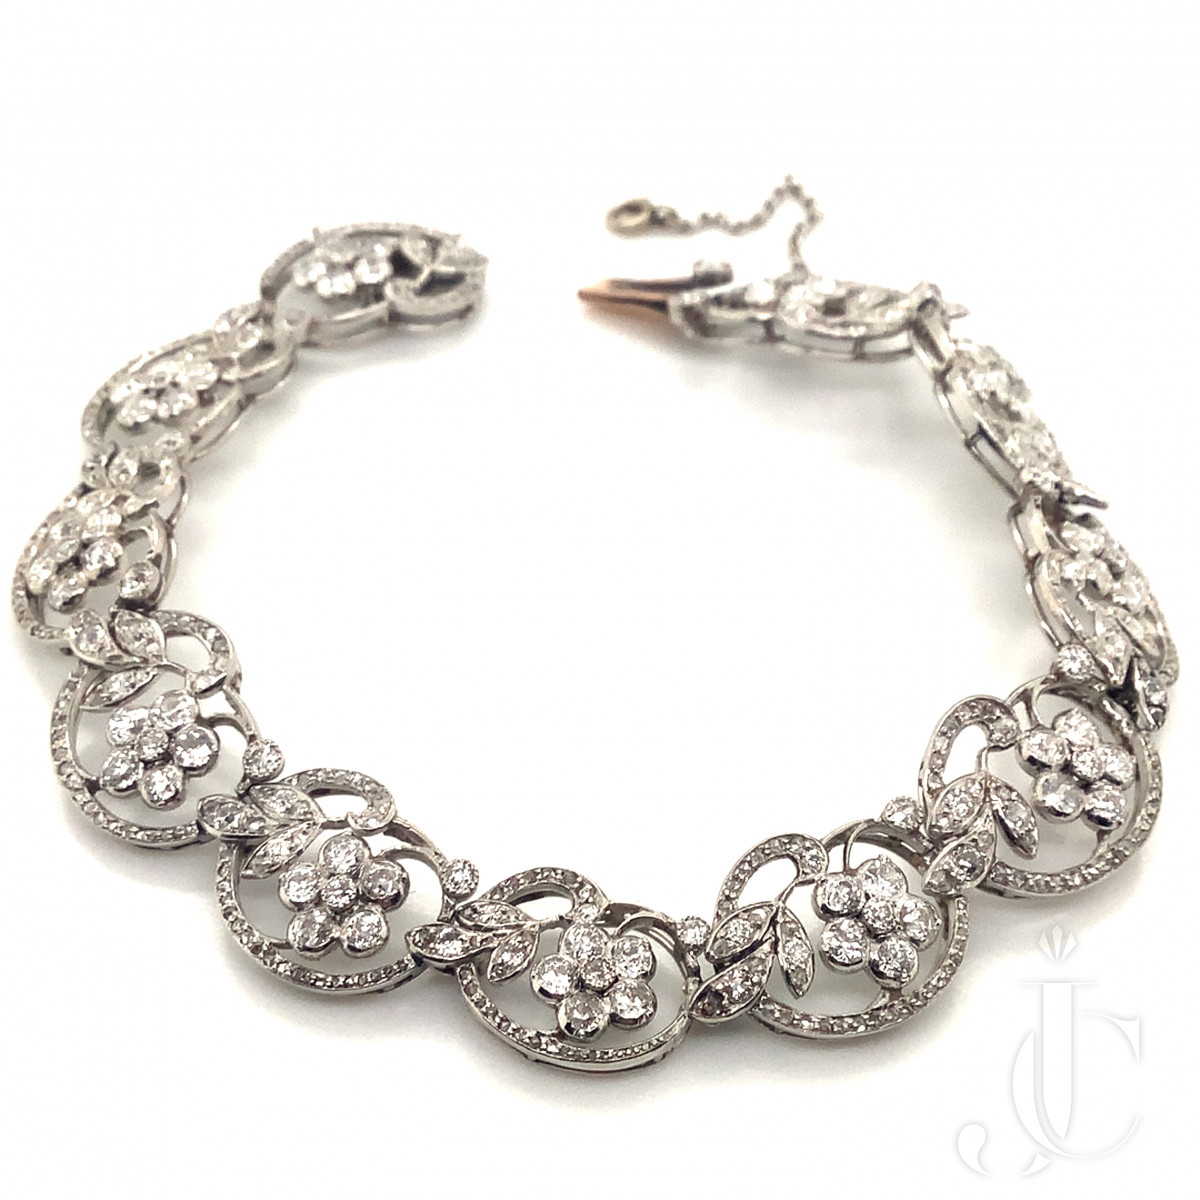 Edwardian Boucheron Bracelet